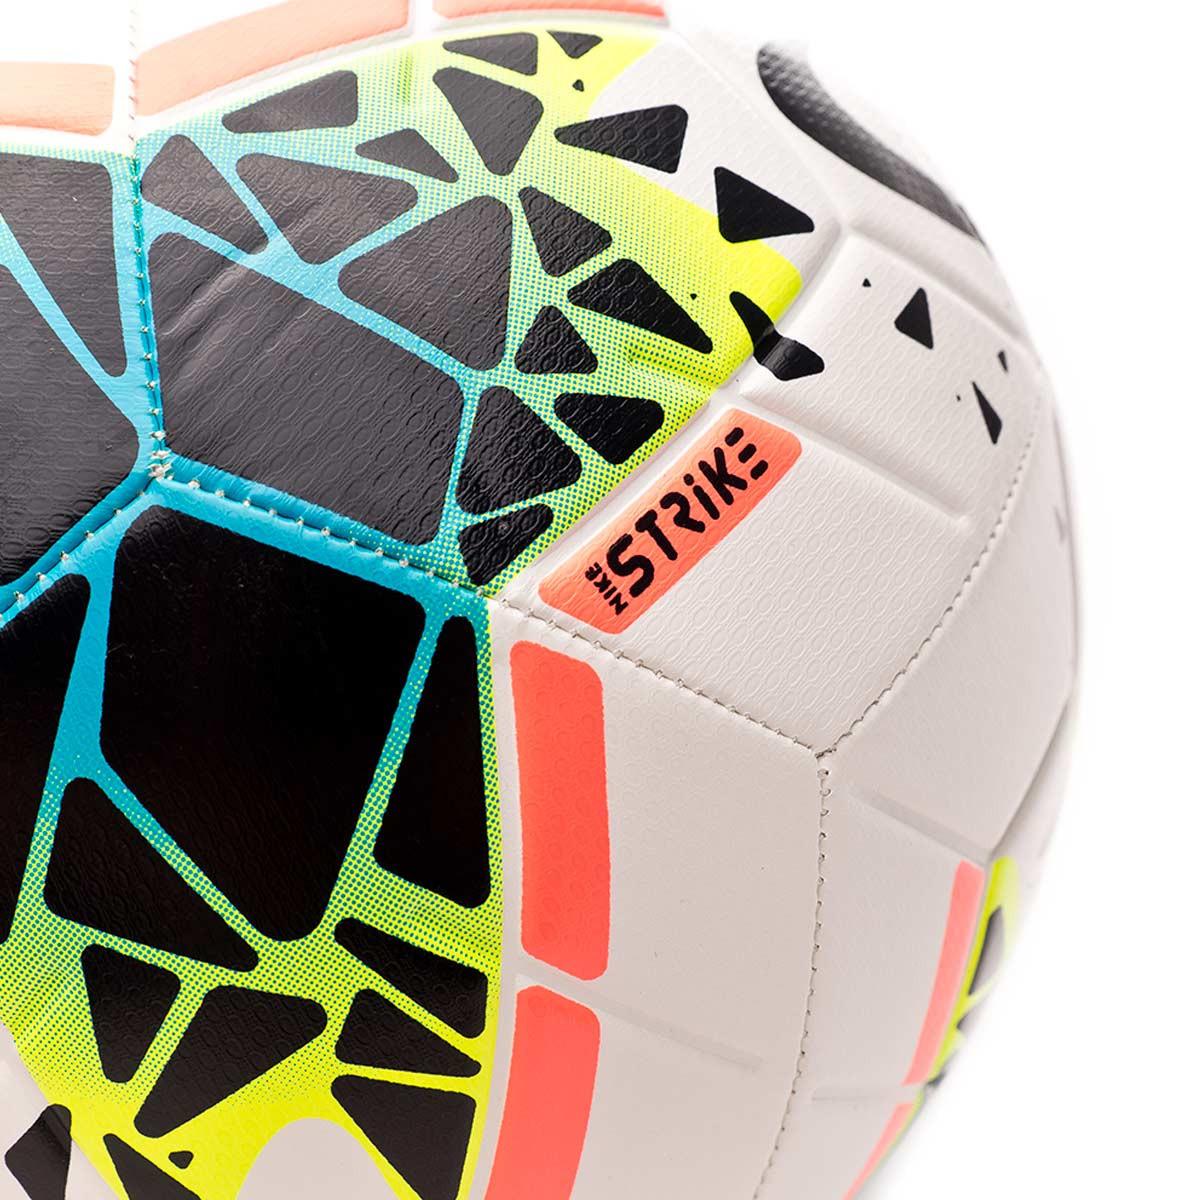 Balon Nike Strike 2019 2020 White Obsidian Blue Fury Tienda De Futbol Futbol Emotion